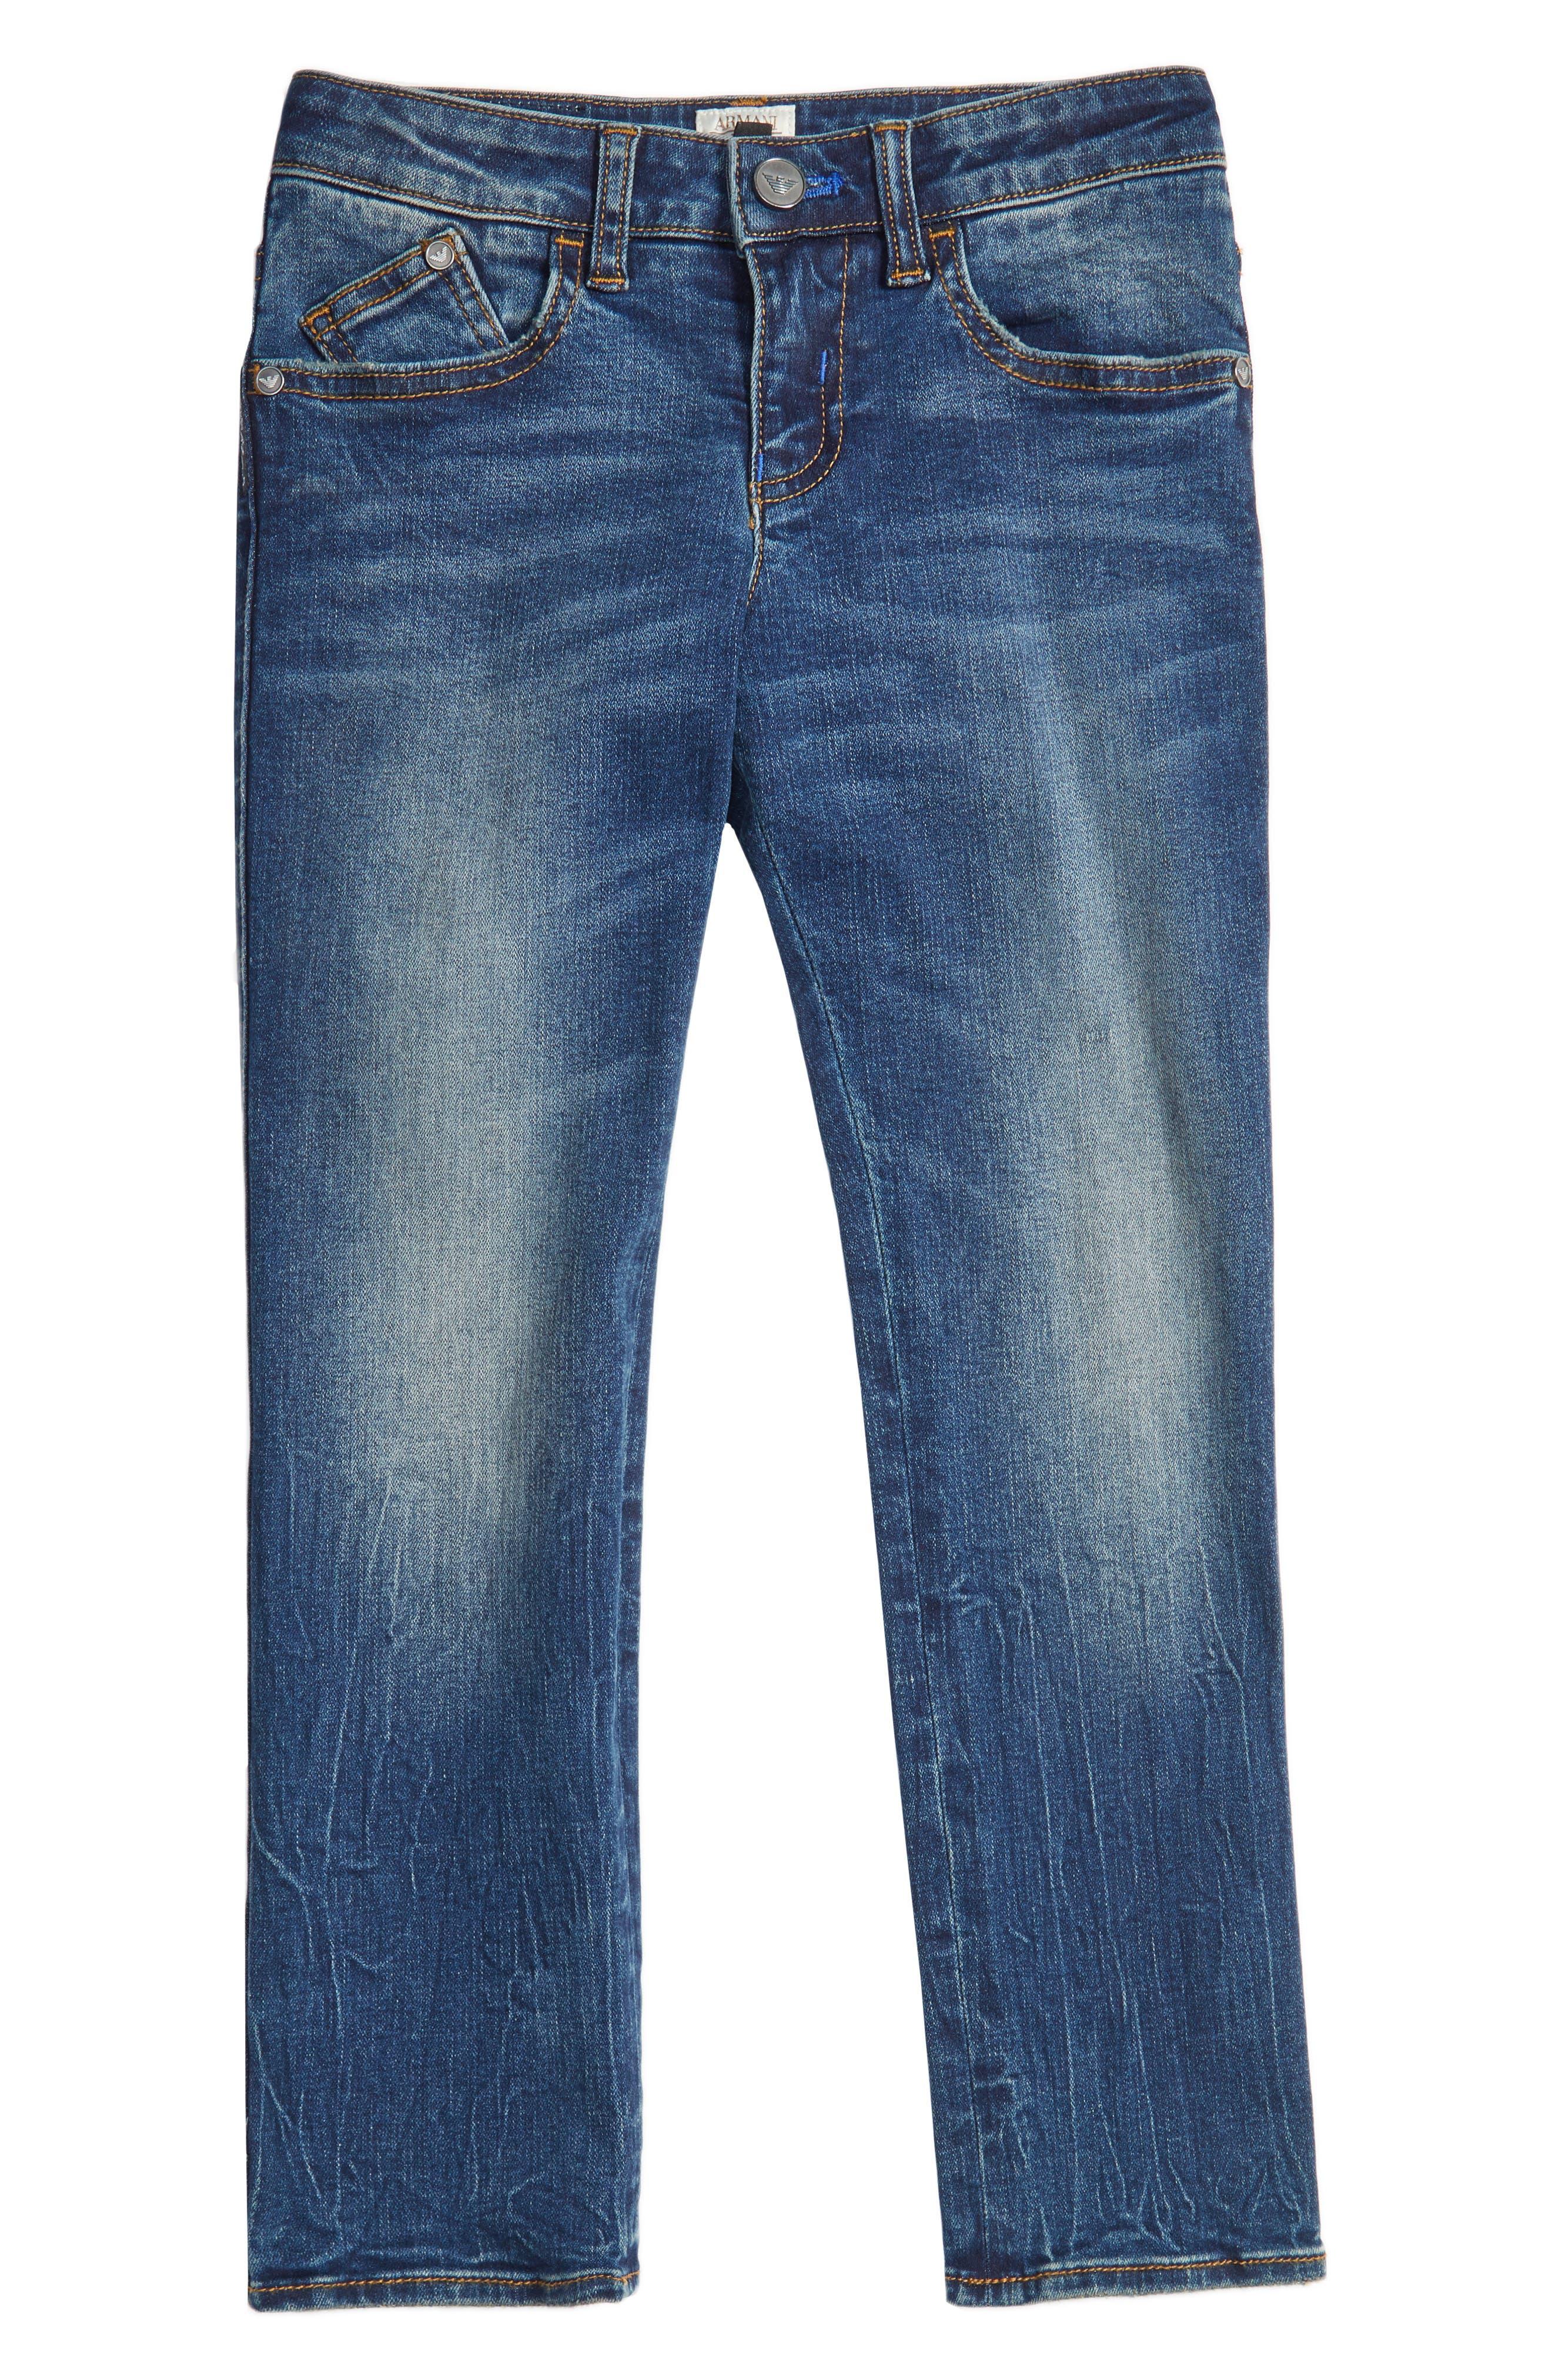 Alternate Image 1 Selected - Armani Junior Slim Straight Leg Jeans (Little Boys & Big Boys)